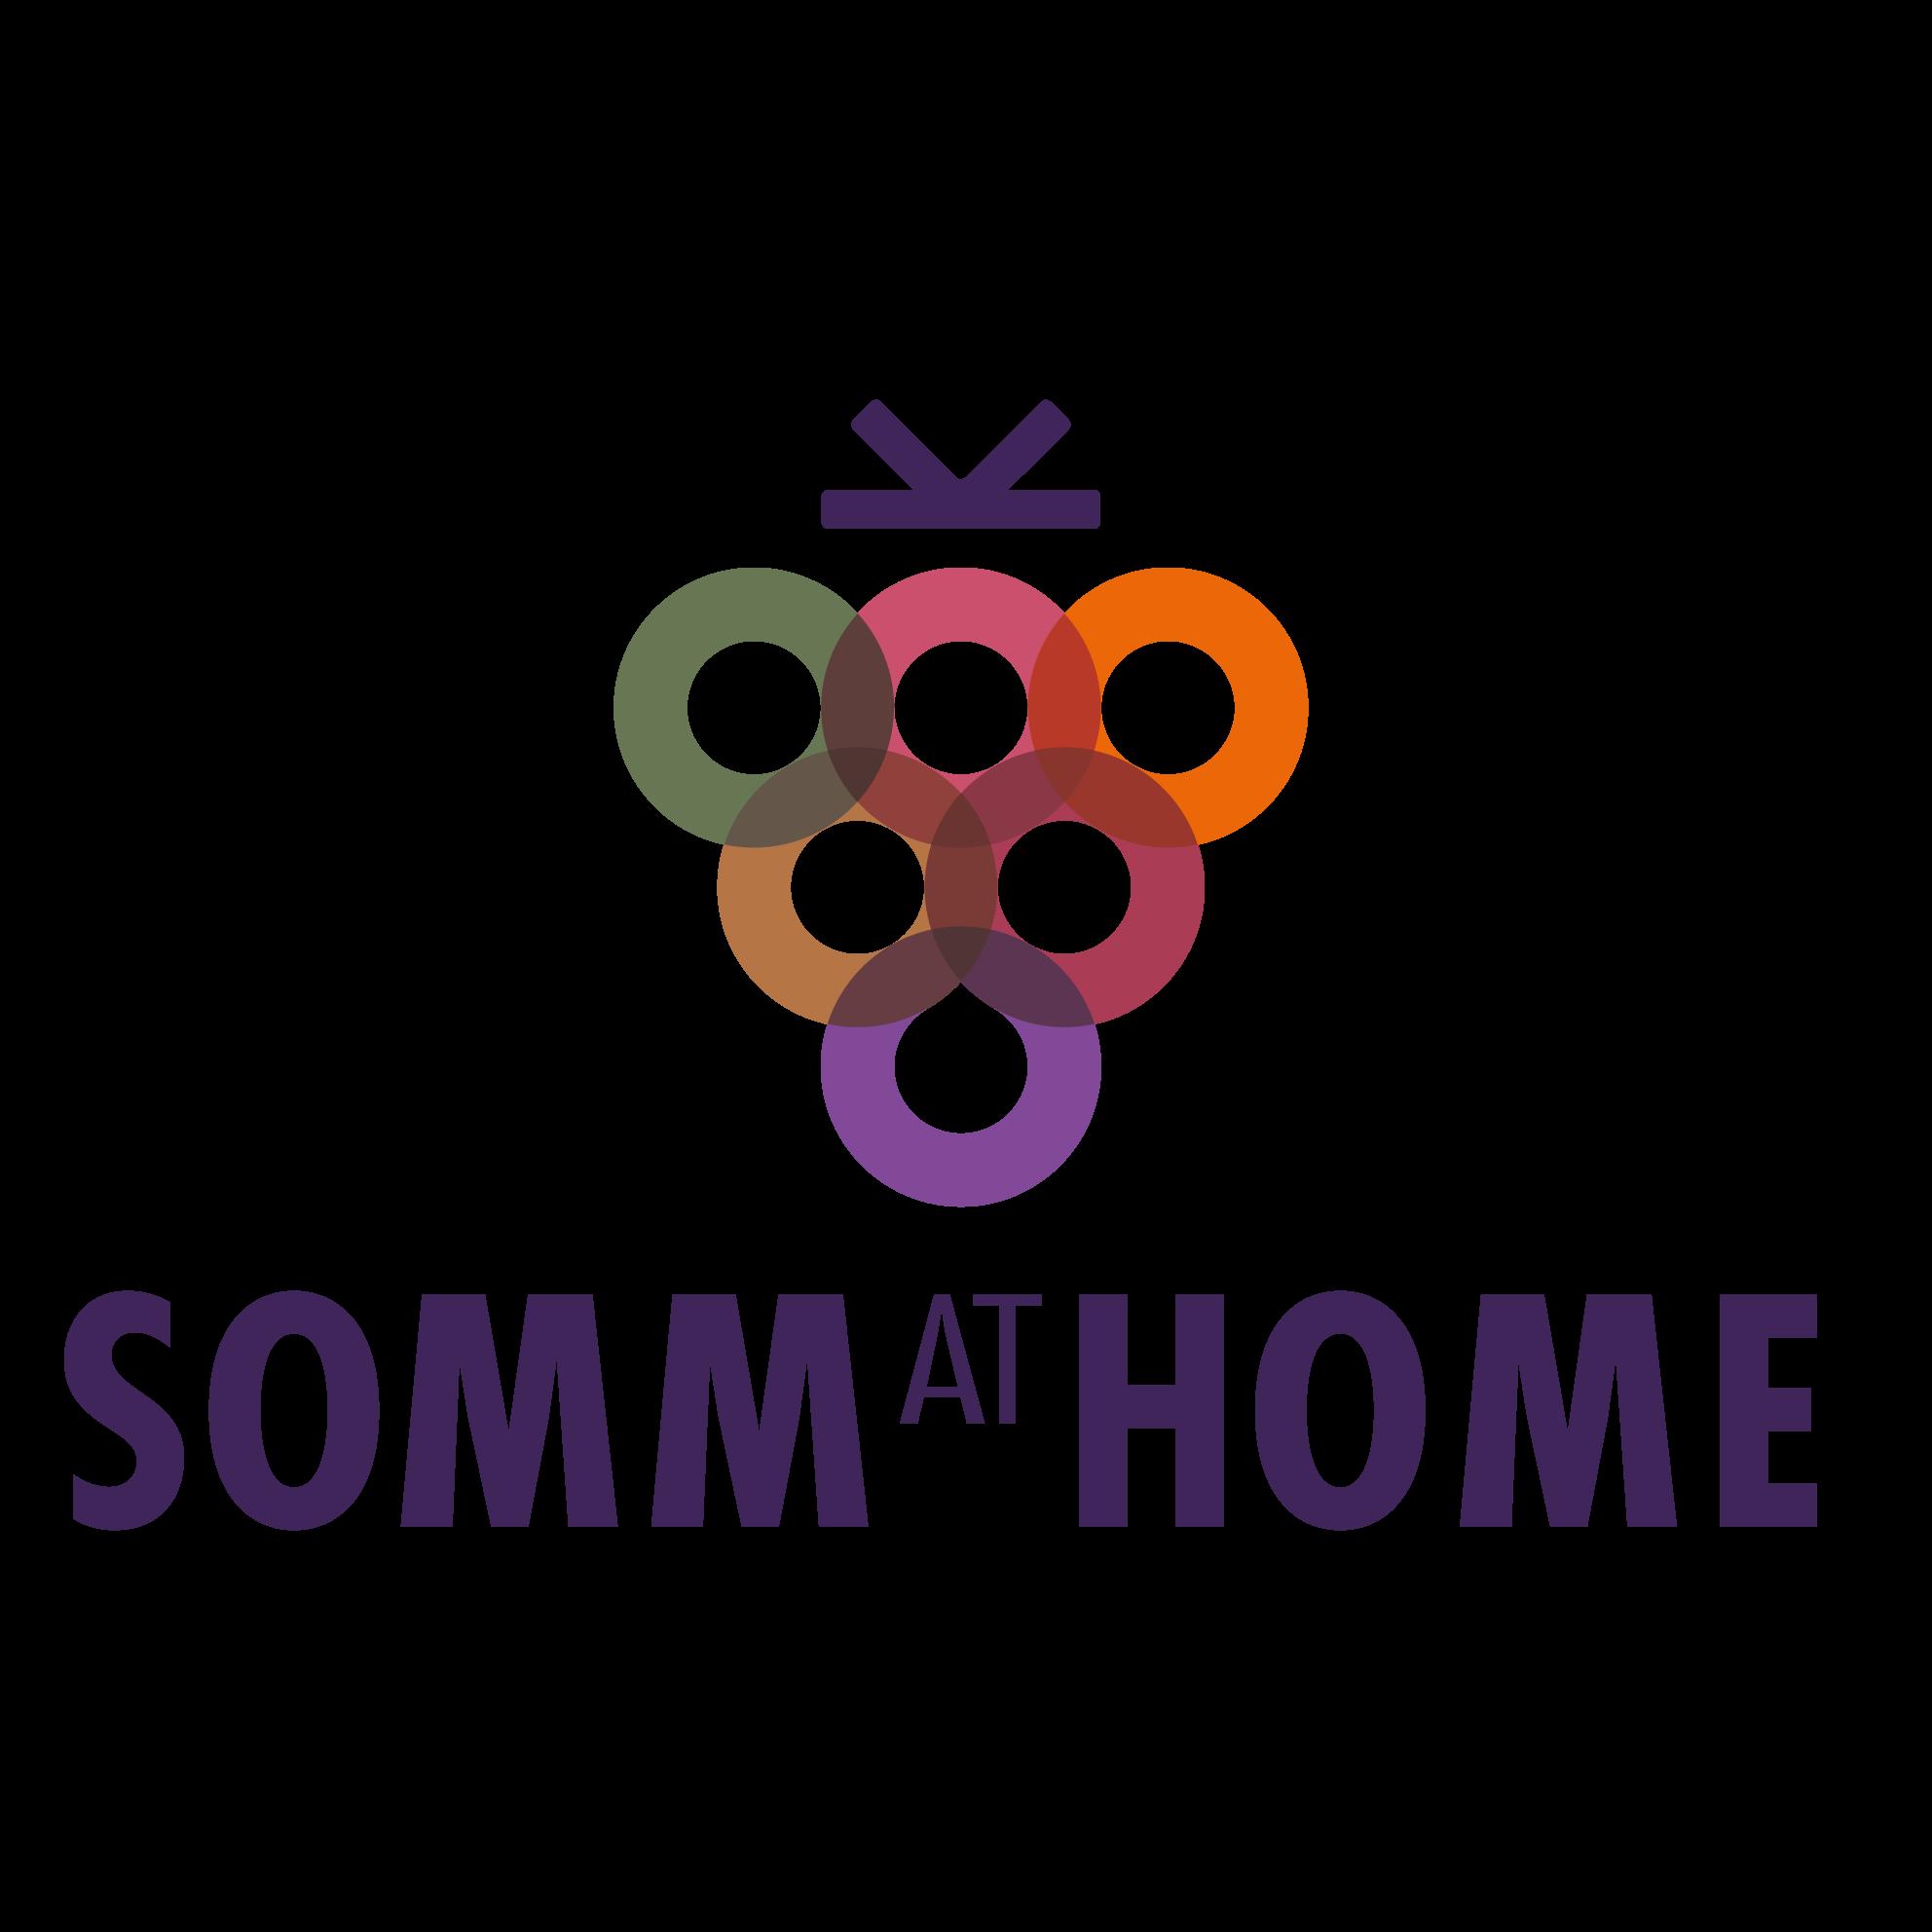 SOMMatHOME